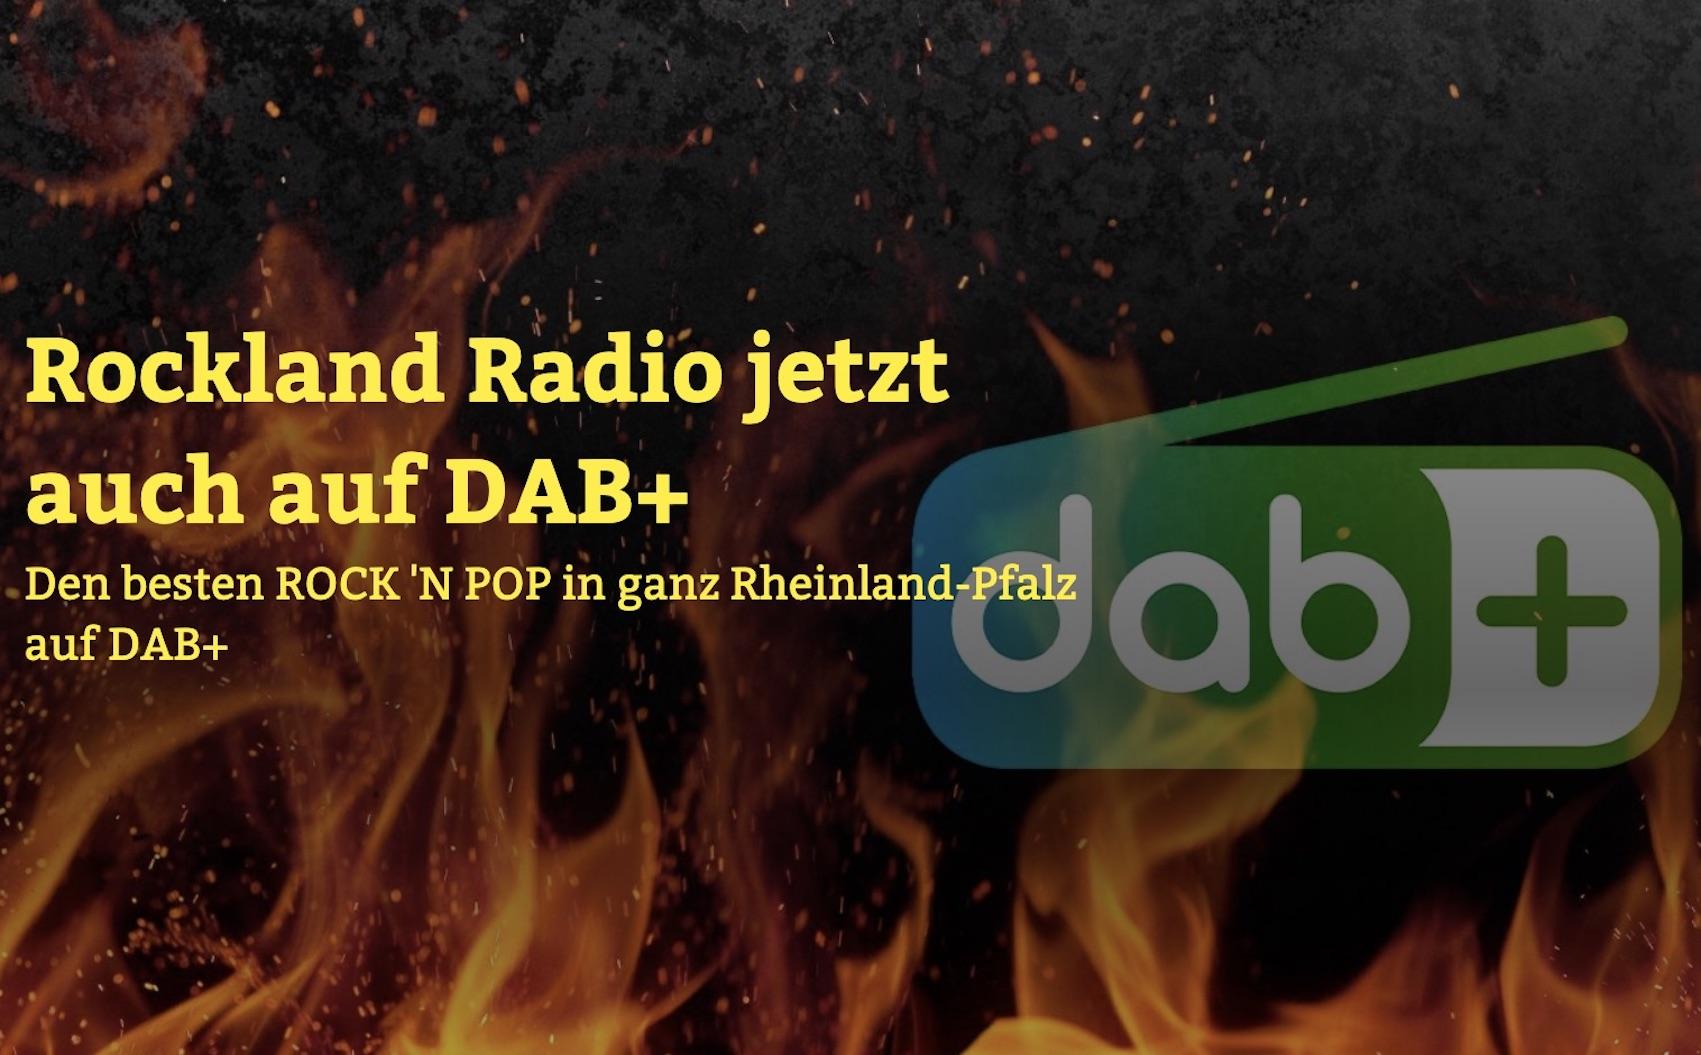 Rockland Radio über DAB+ (Foto: Rockland Radio)